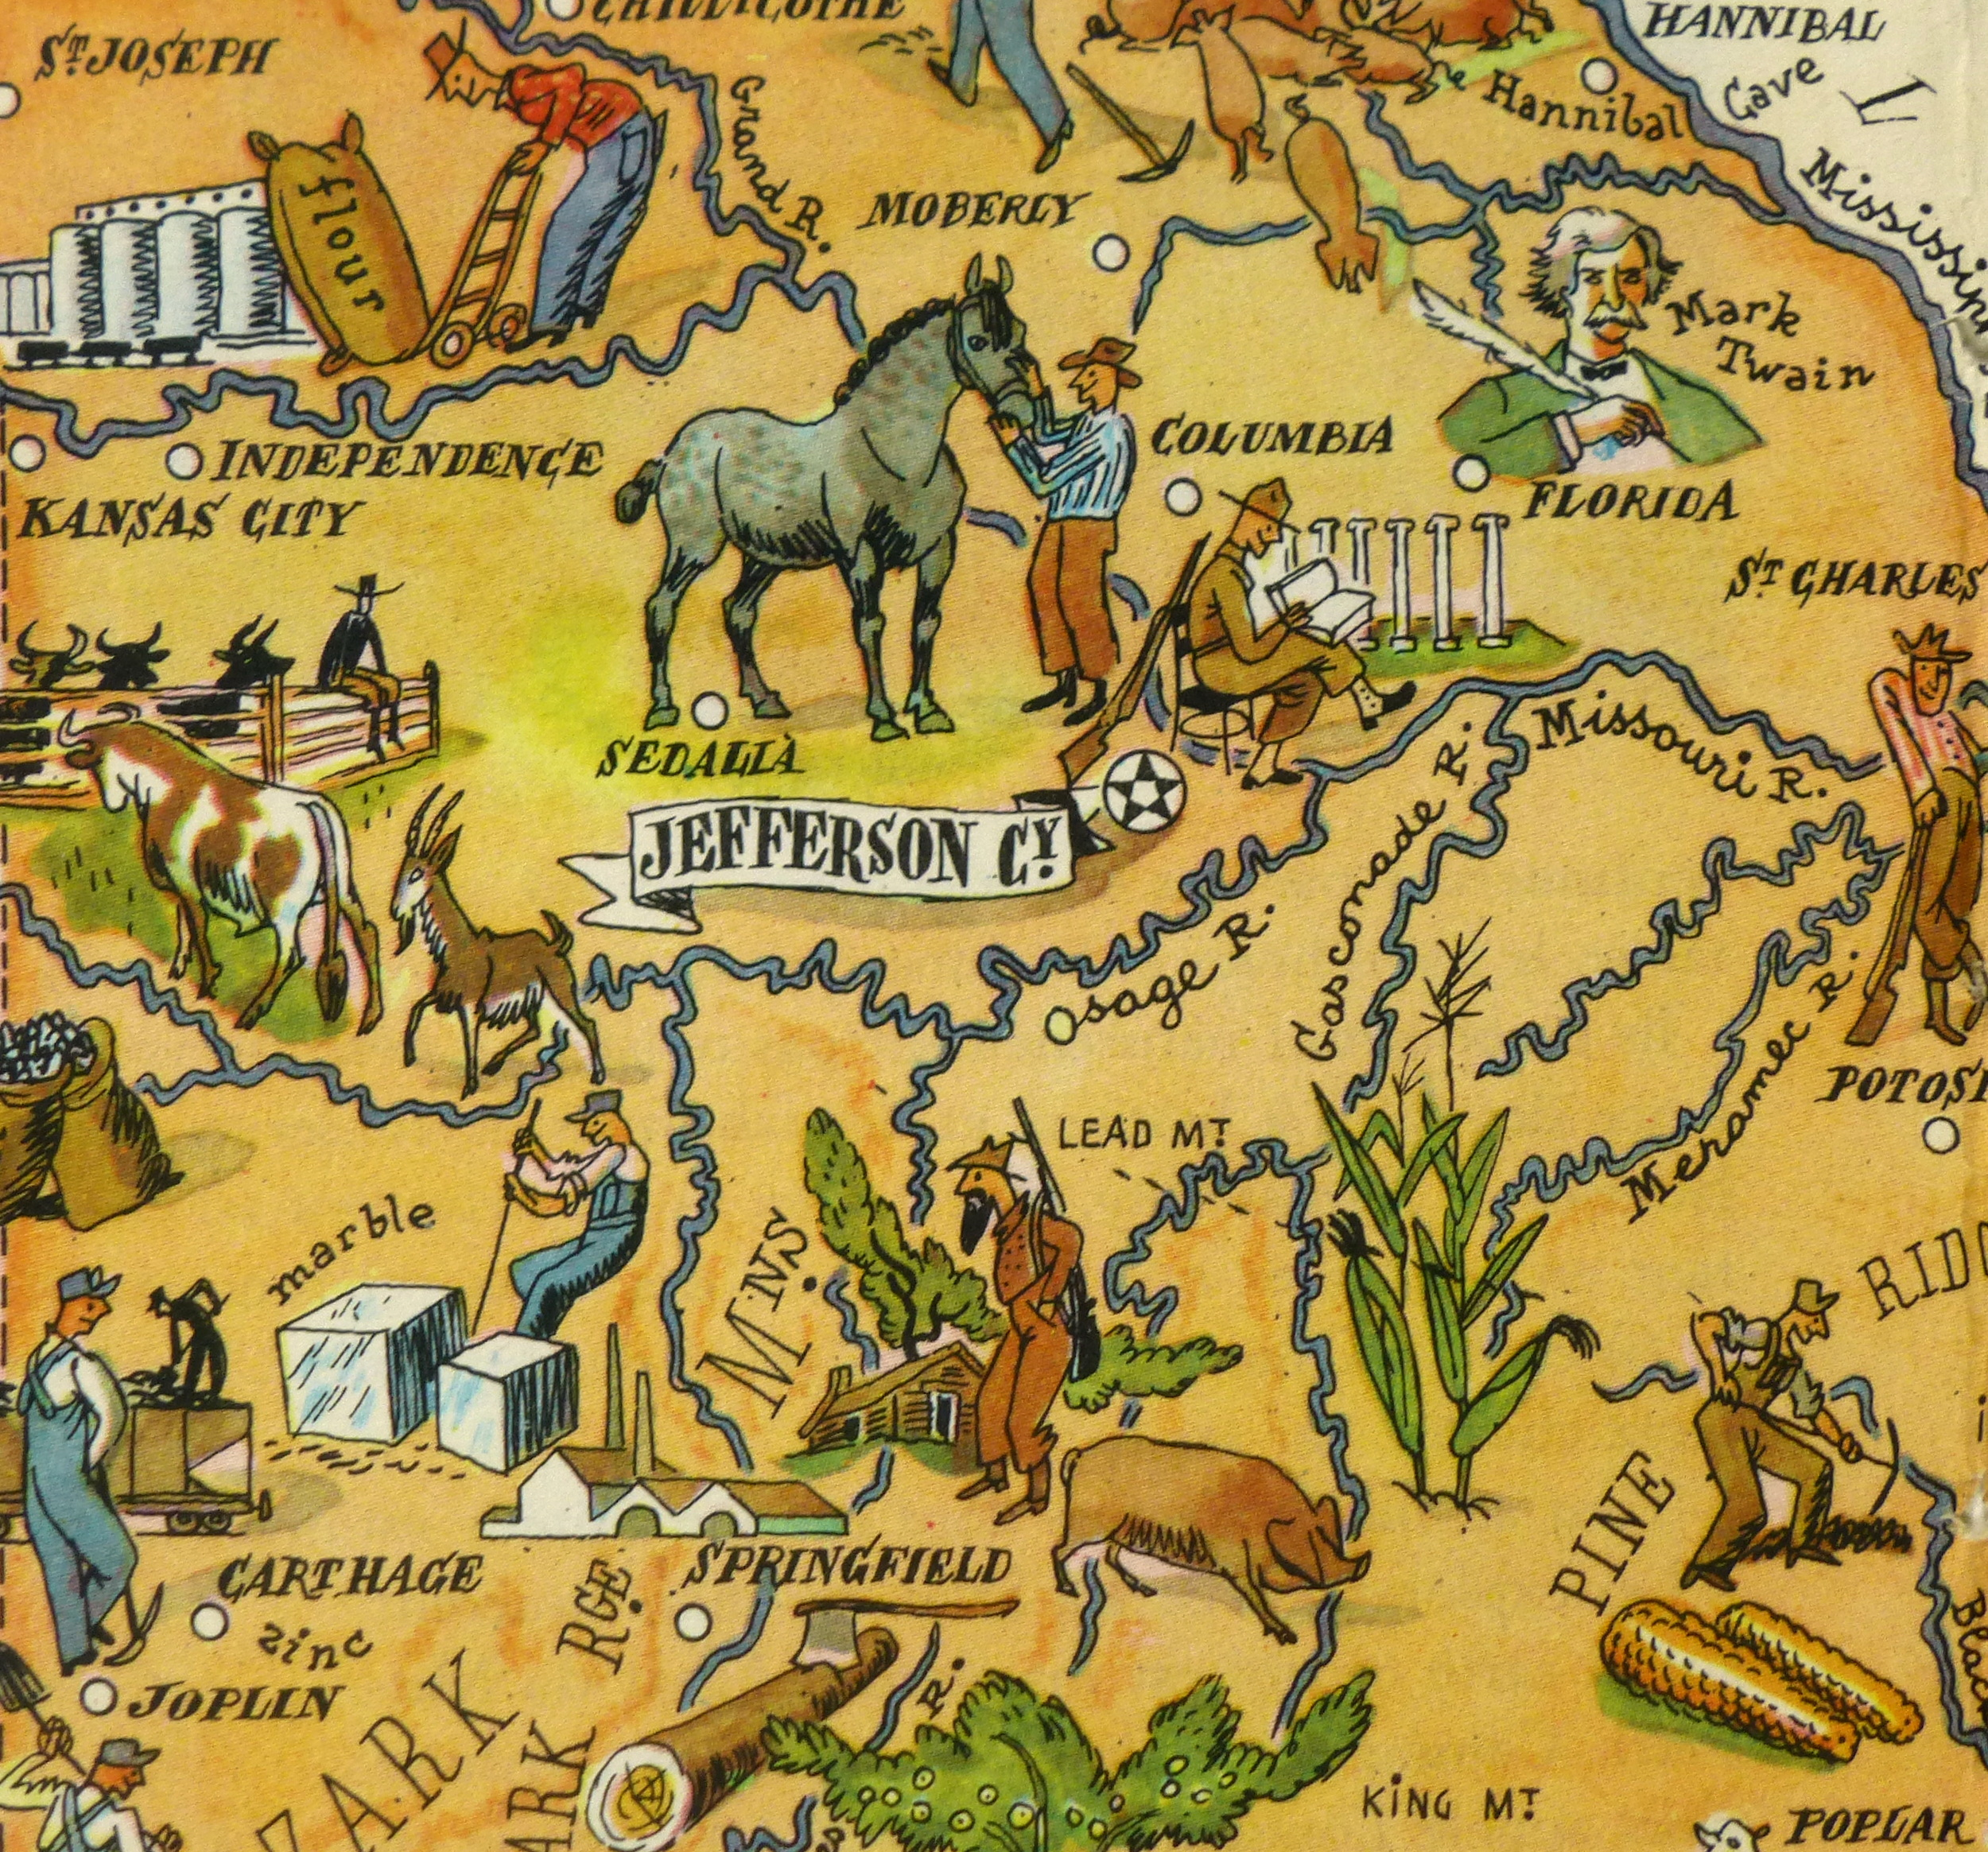 Missouri Pictorial Map, 1946-detail-6270K